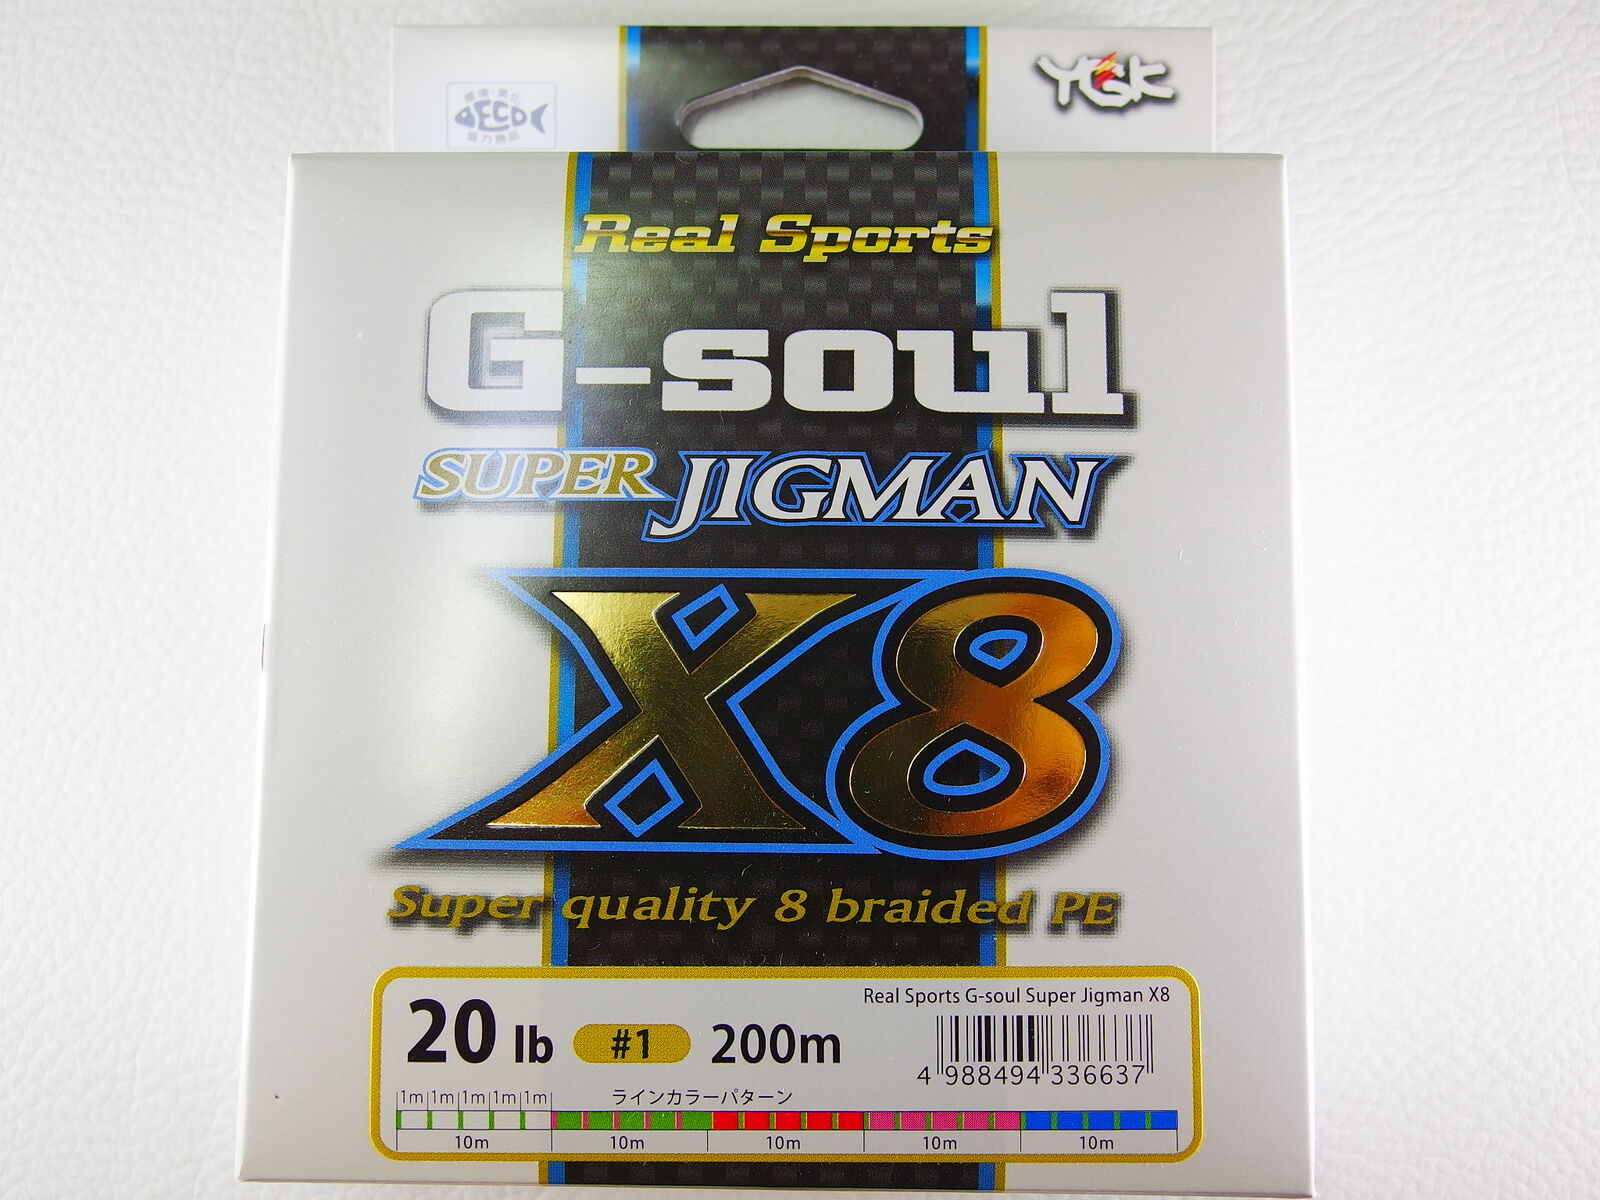 YGK - G-SOUL X8 SUPER JIGMAN PE 200m 20lb